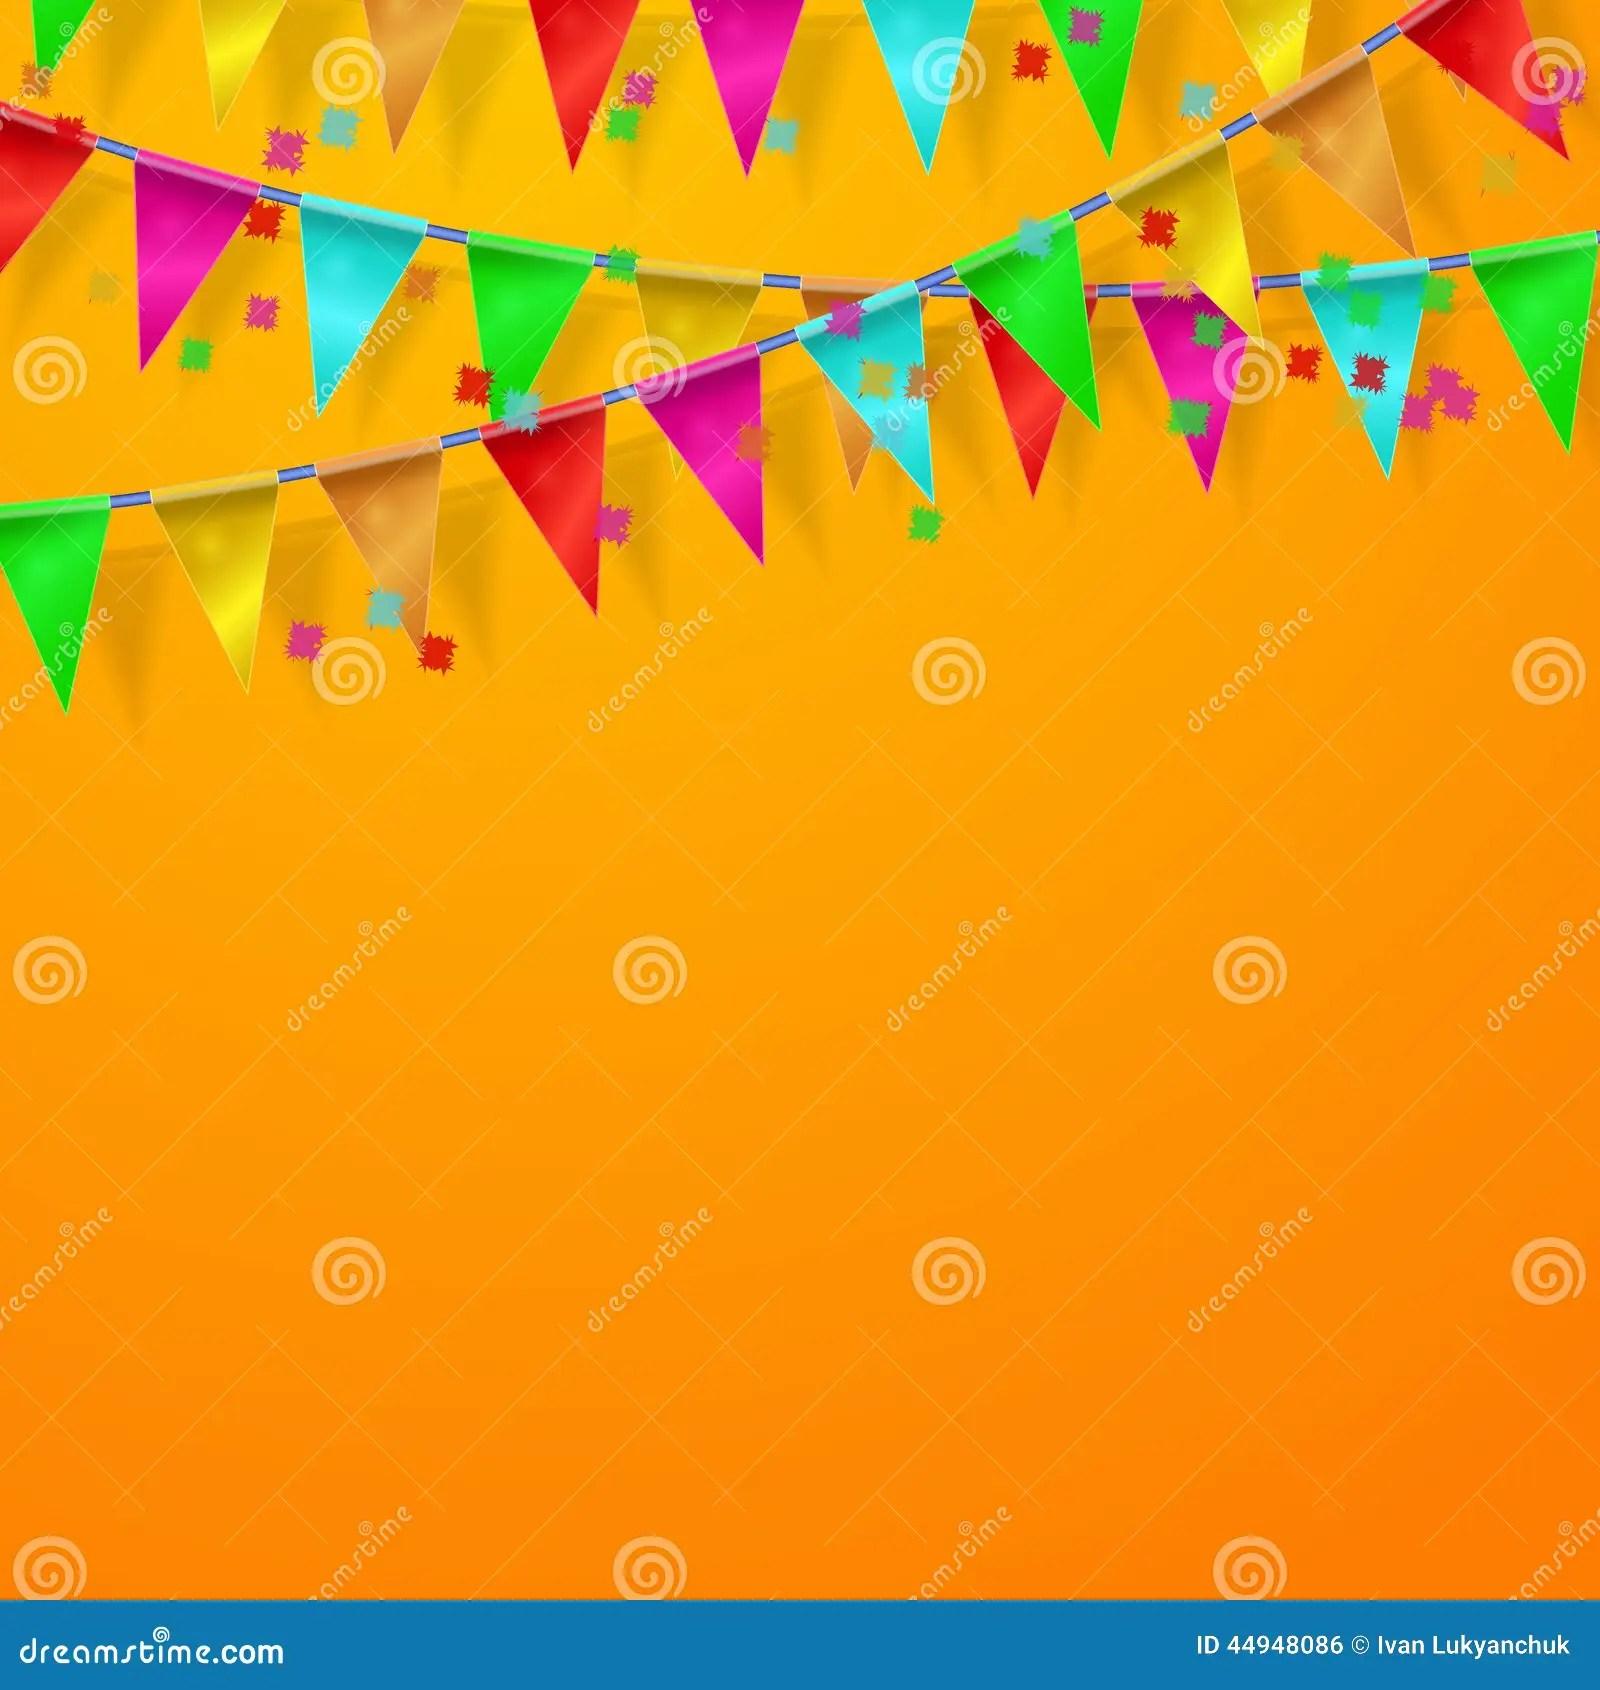 Fall Themed Wallpapers Cartoon Festival Carnival Celebration Orange Background Stock